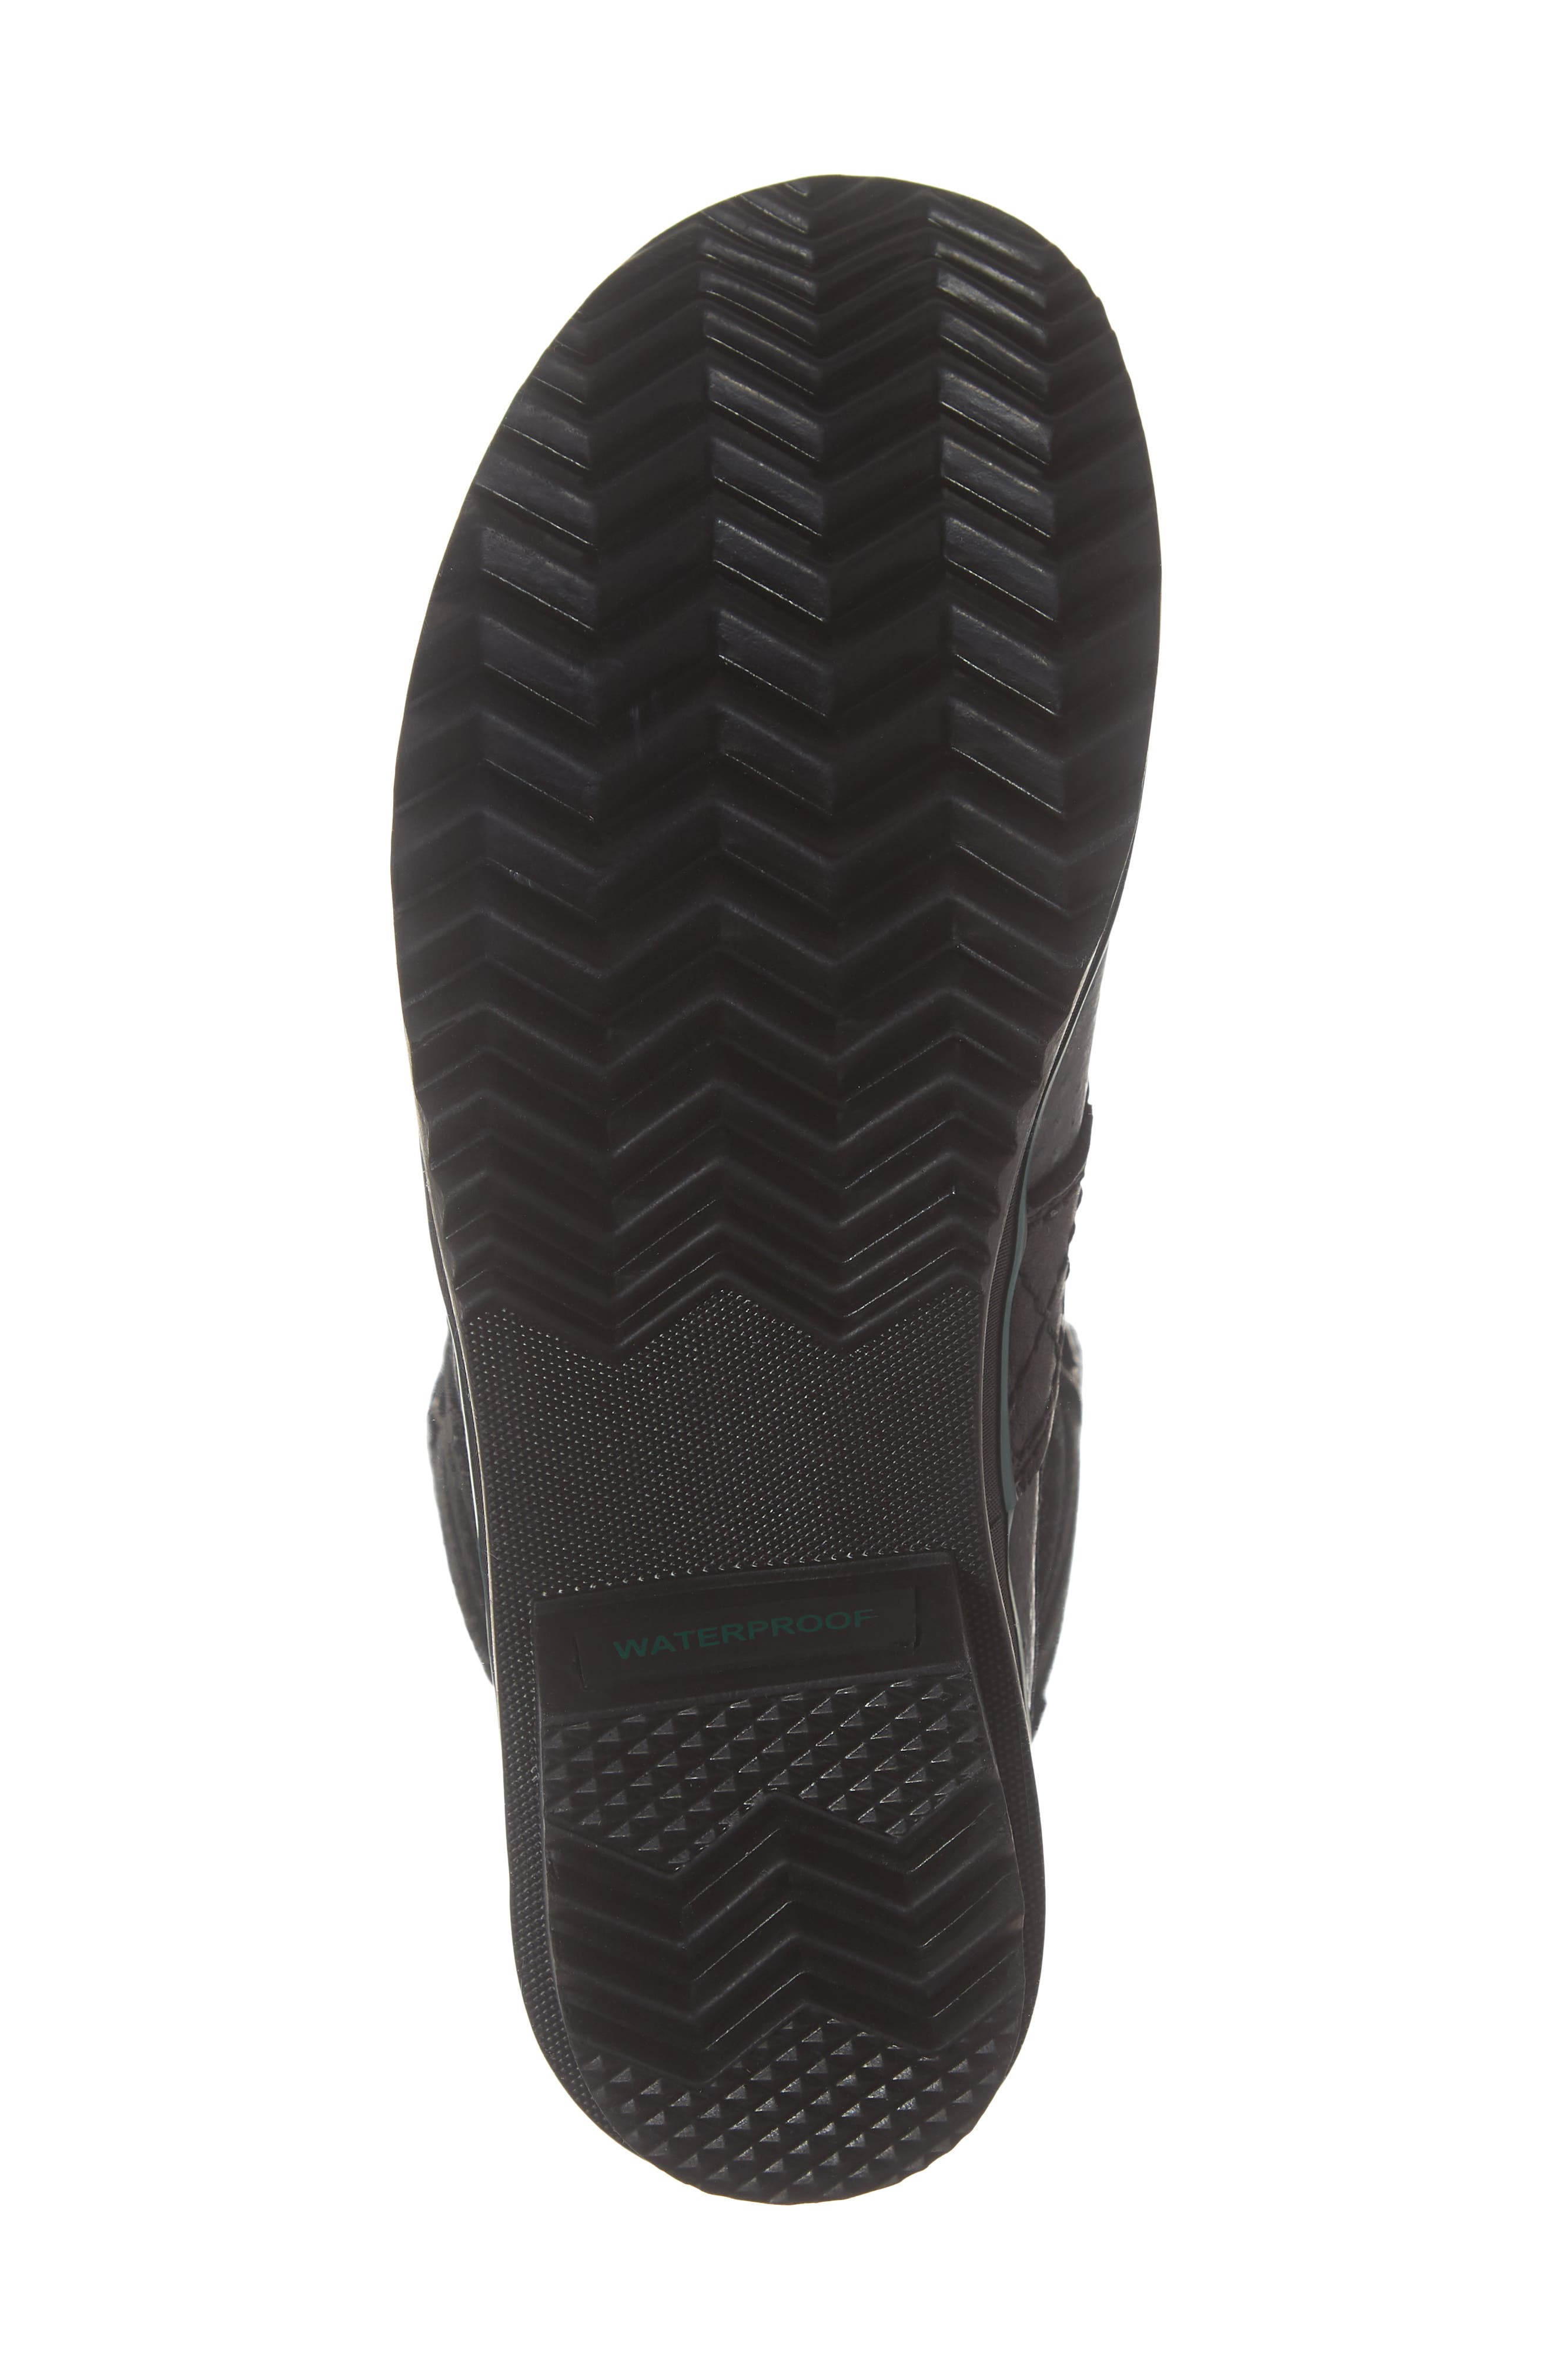 Tofino Faux Fur & Genuine Shearling Lined Waterproof Boot,                             Alternate thumbnail 6, color,                             BLACK